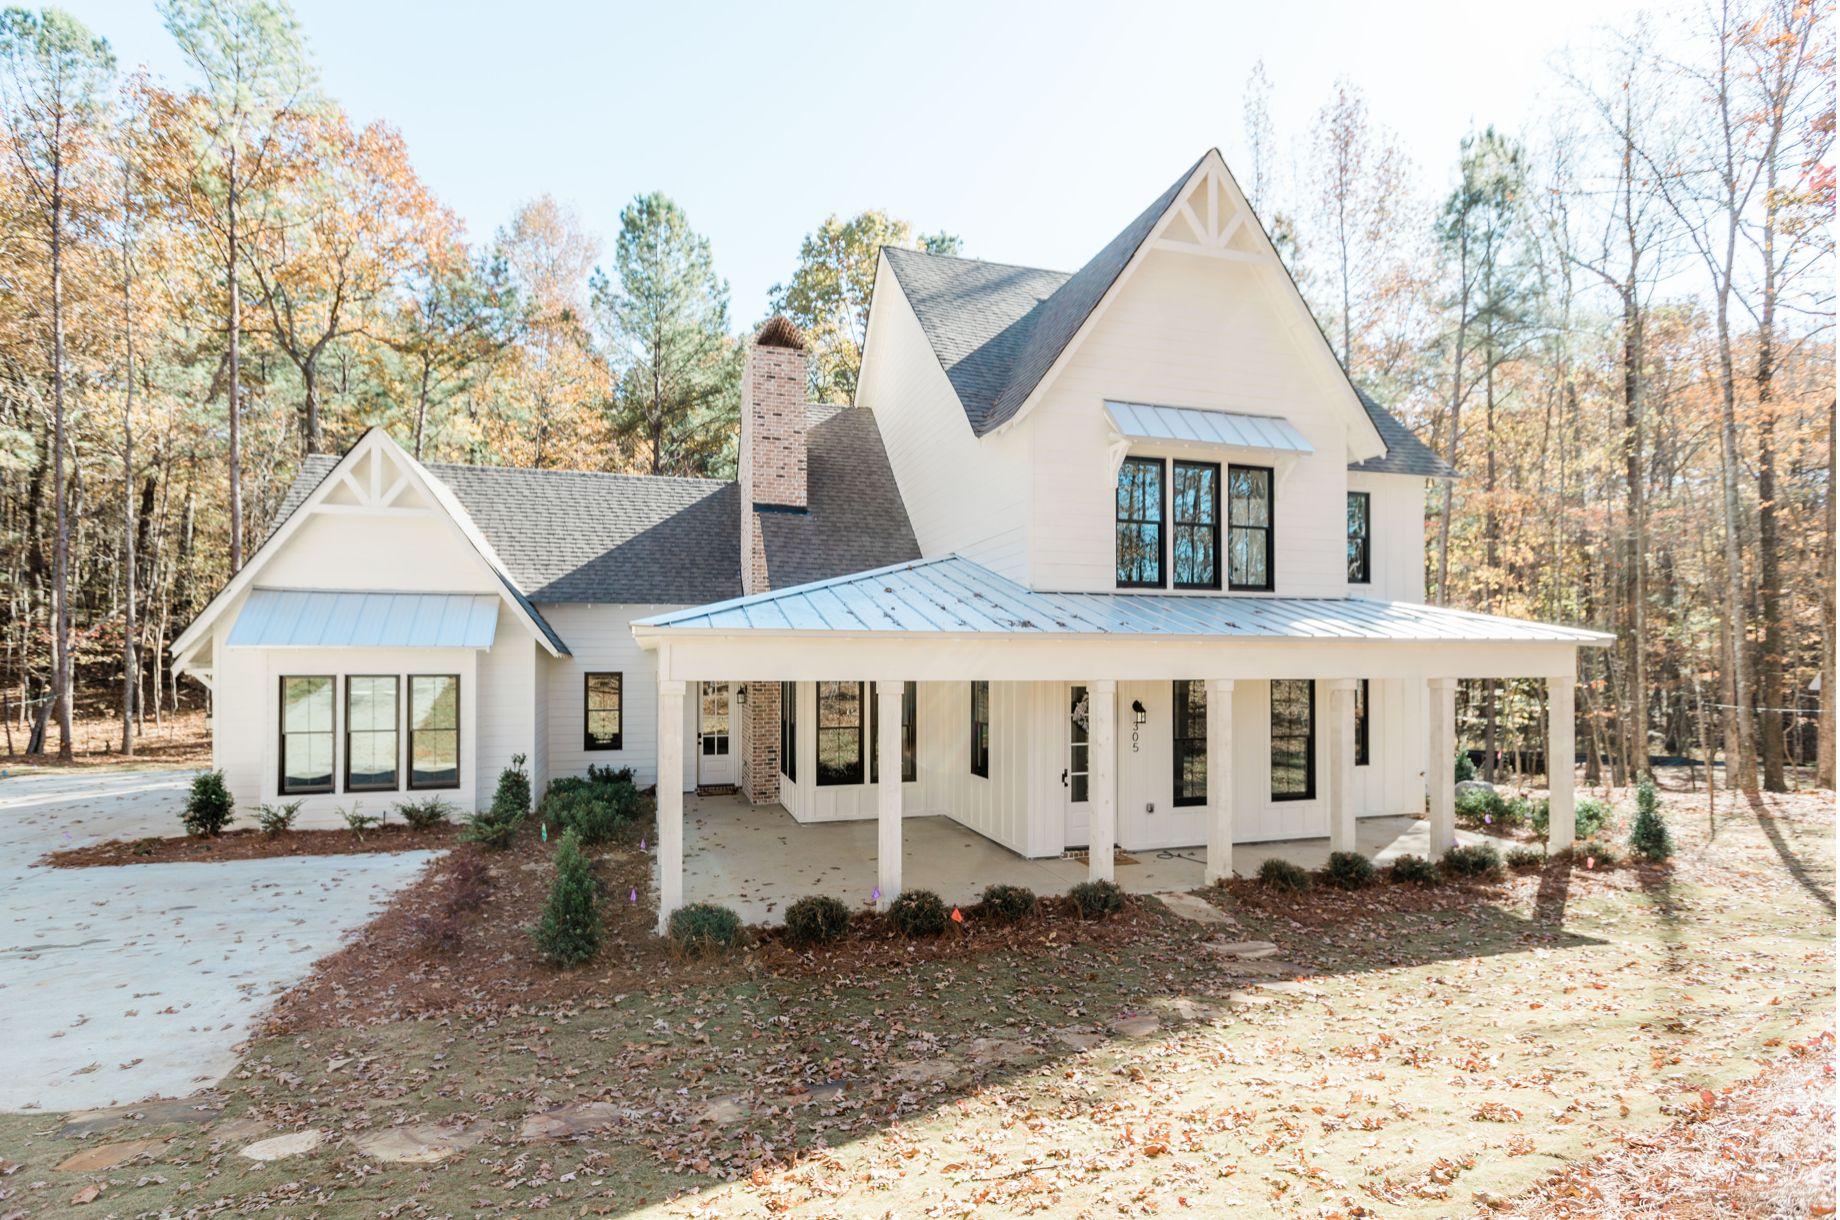 The Farmville Cottage:The Farmville Cottage